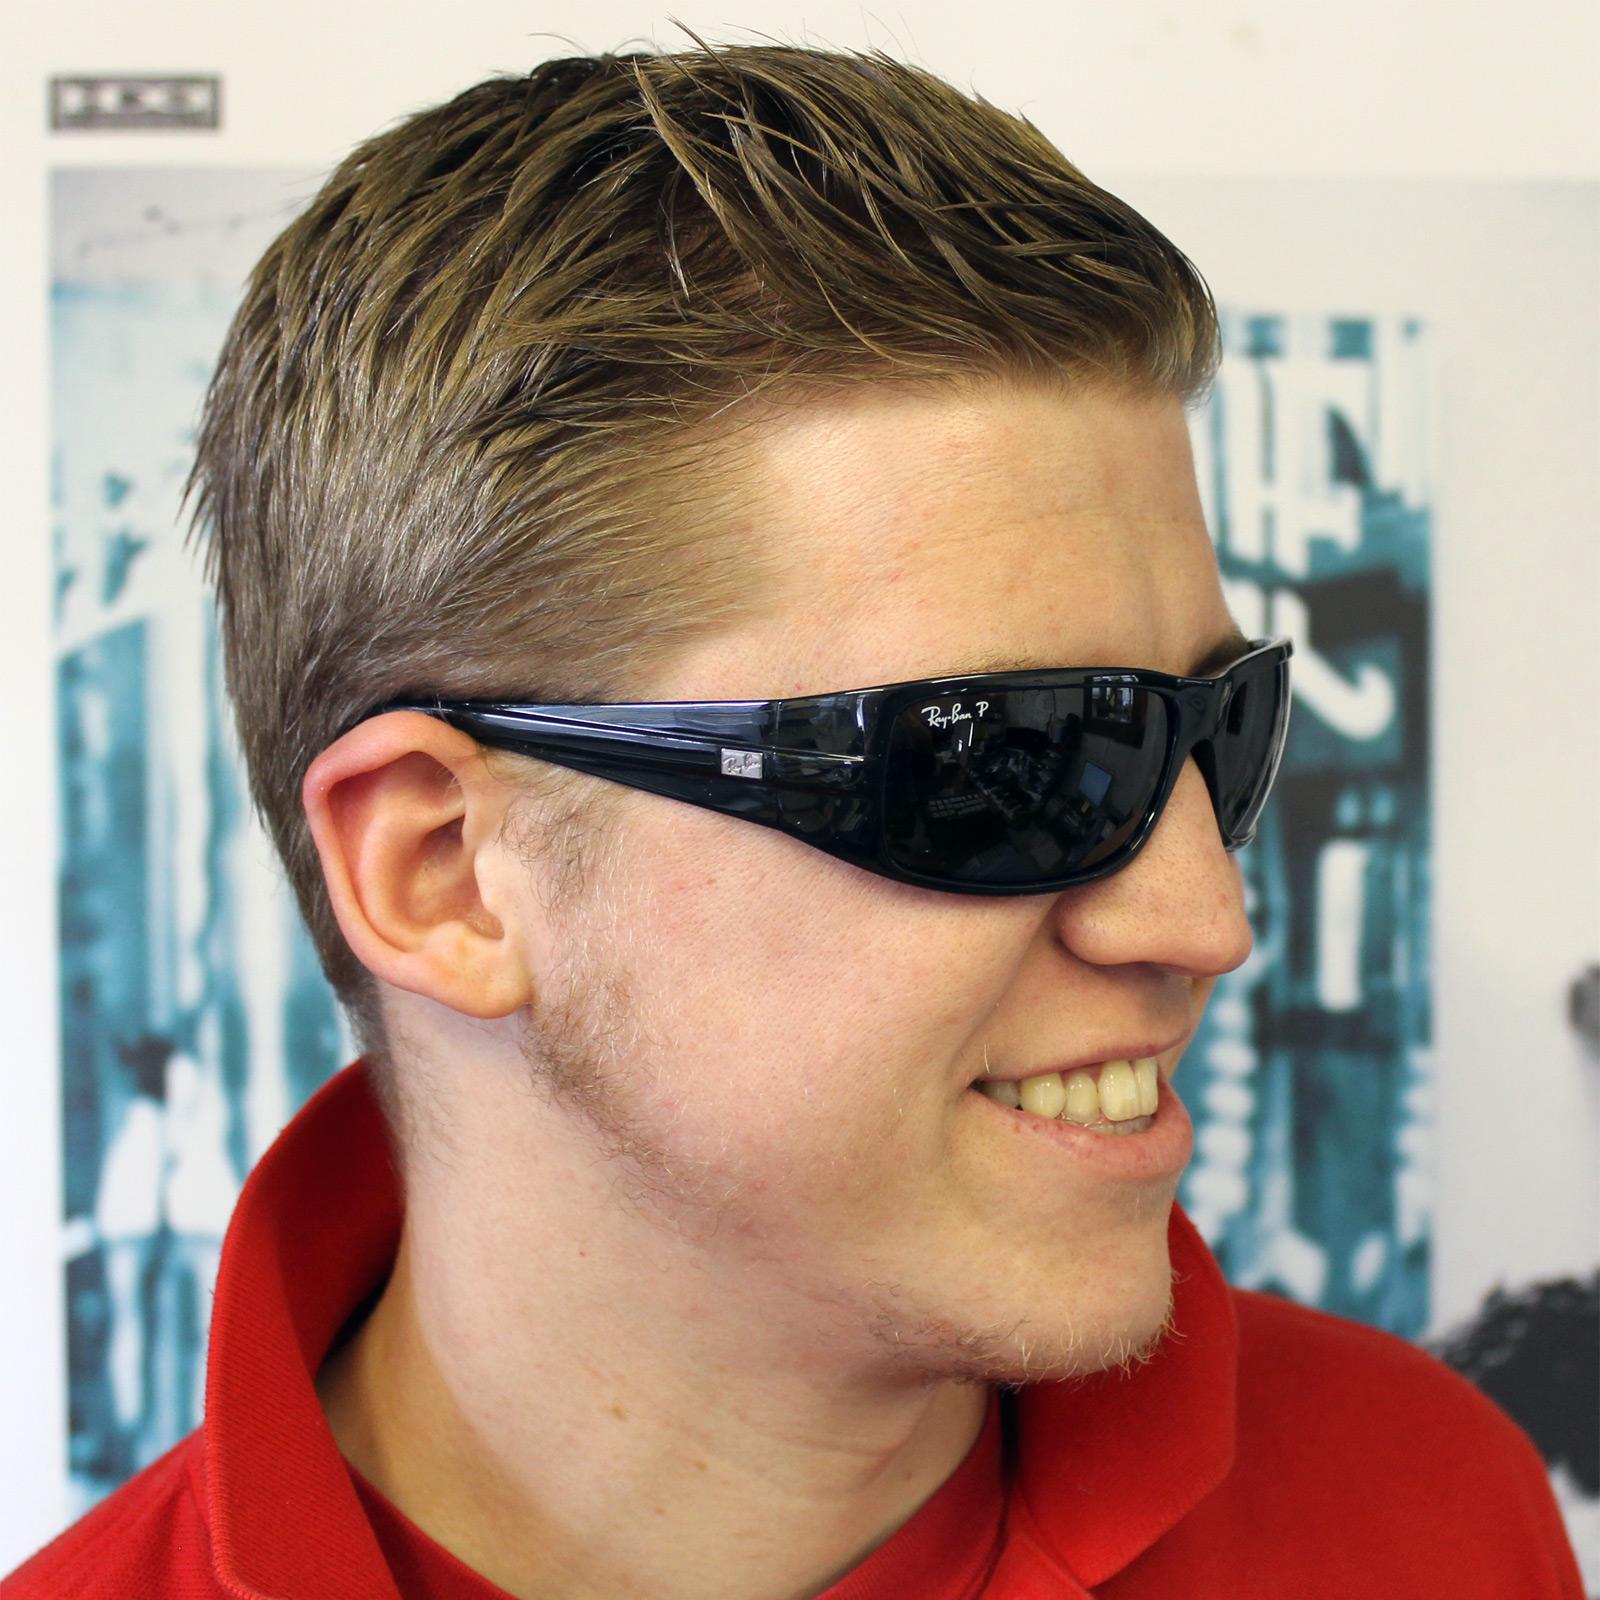 Cheap Rayban Sunglasses 4057 Black Green Polarized 601 58